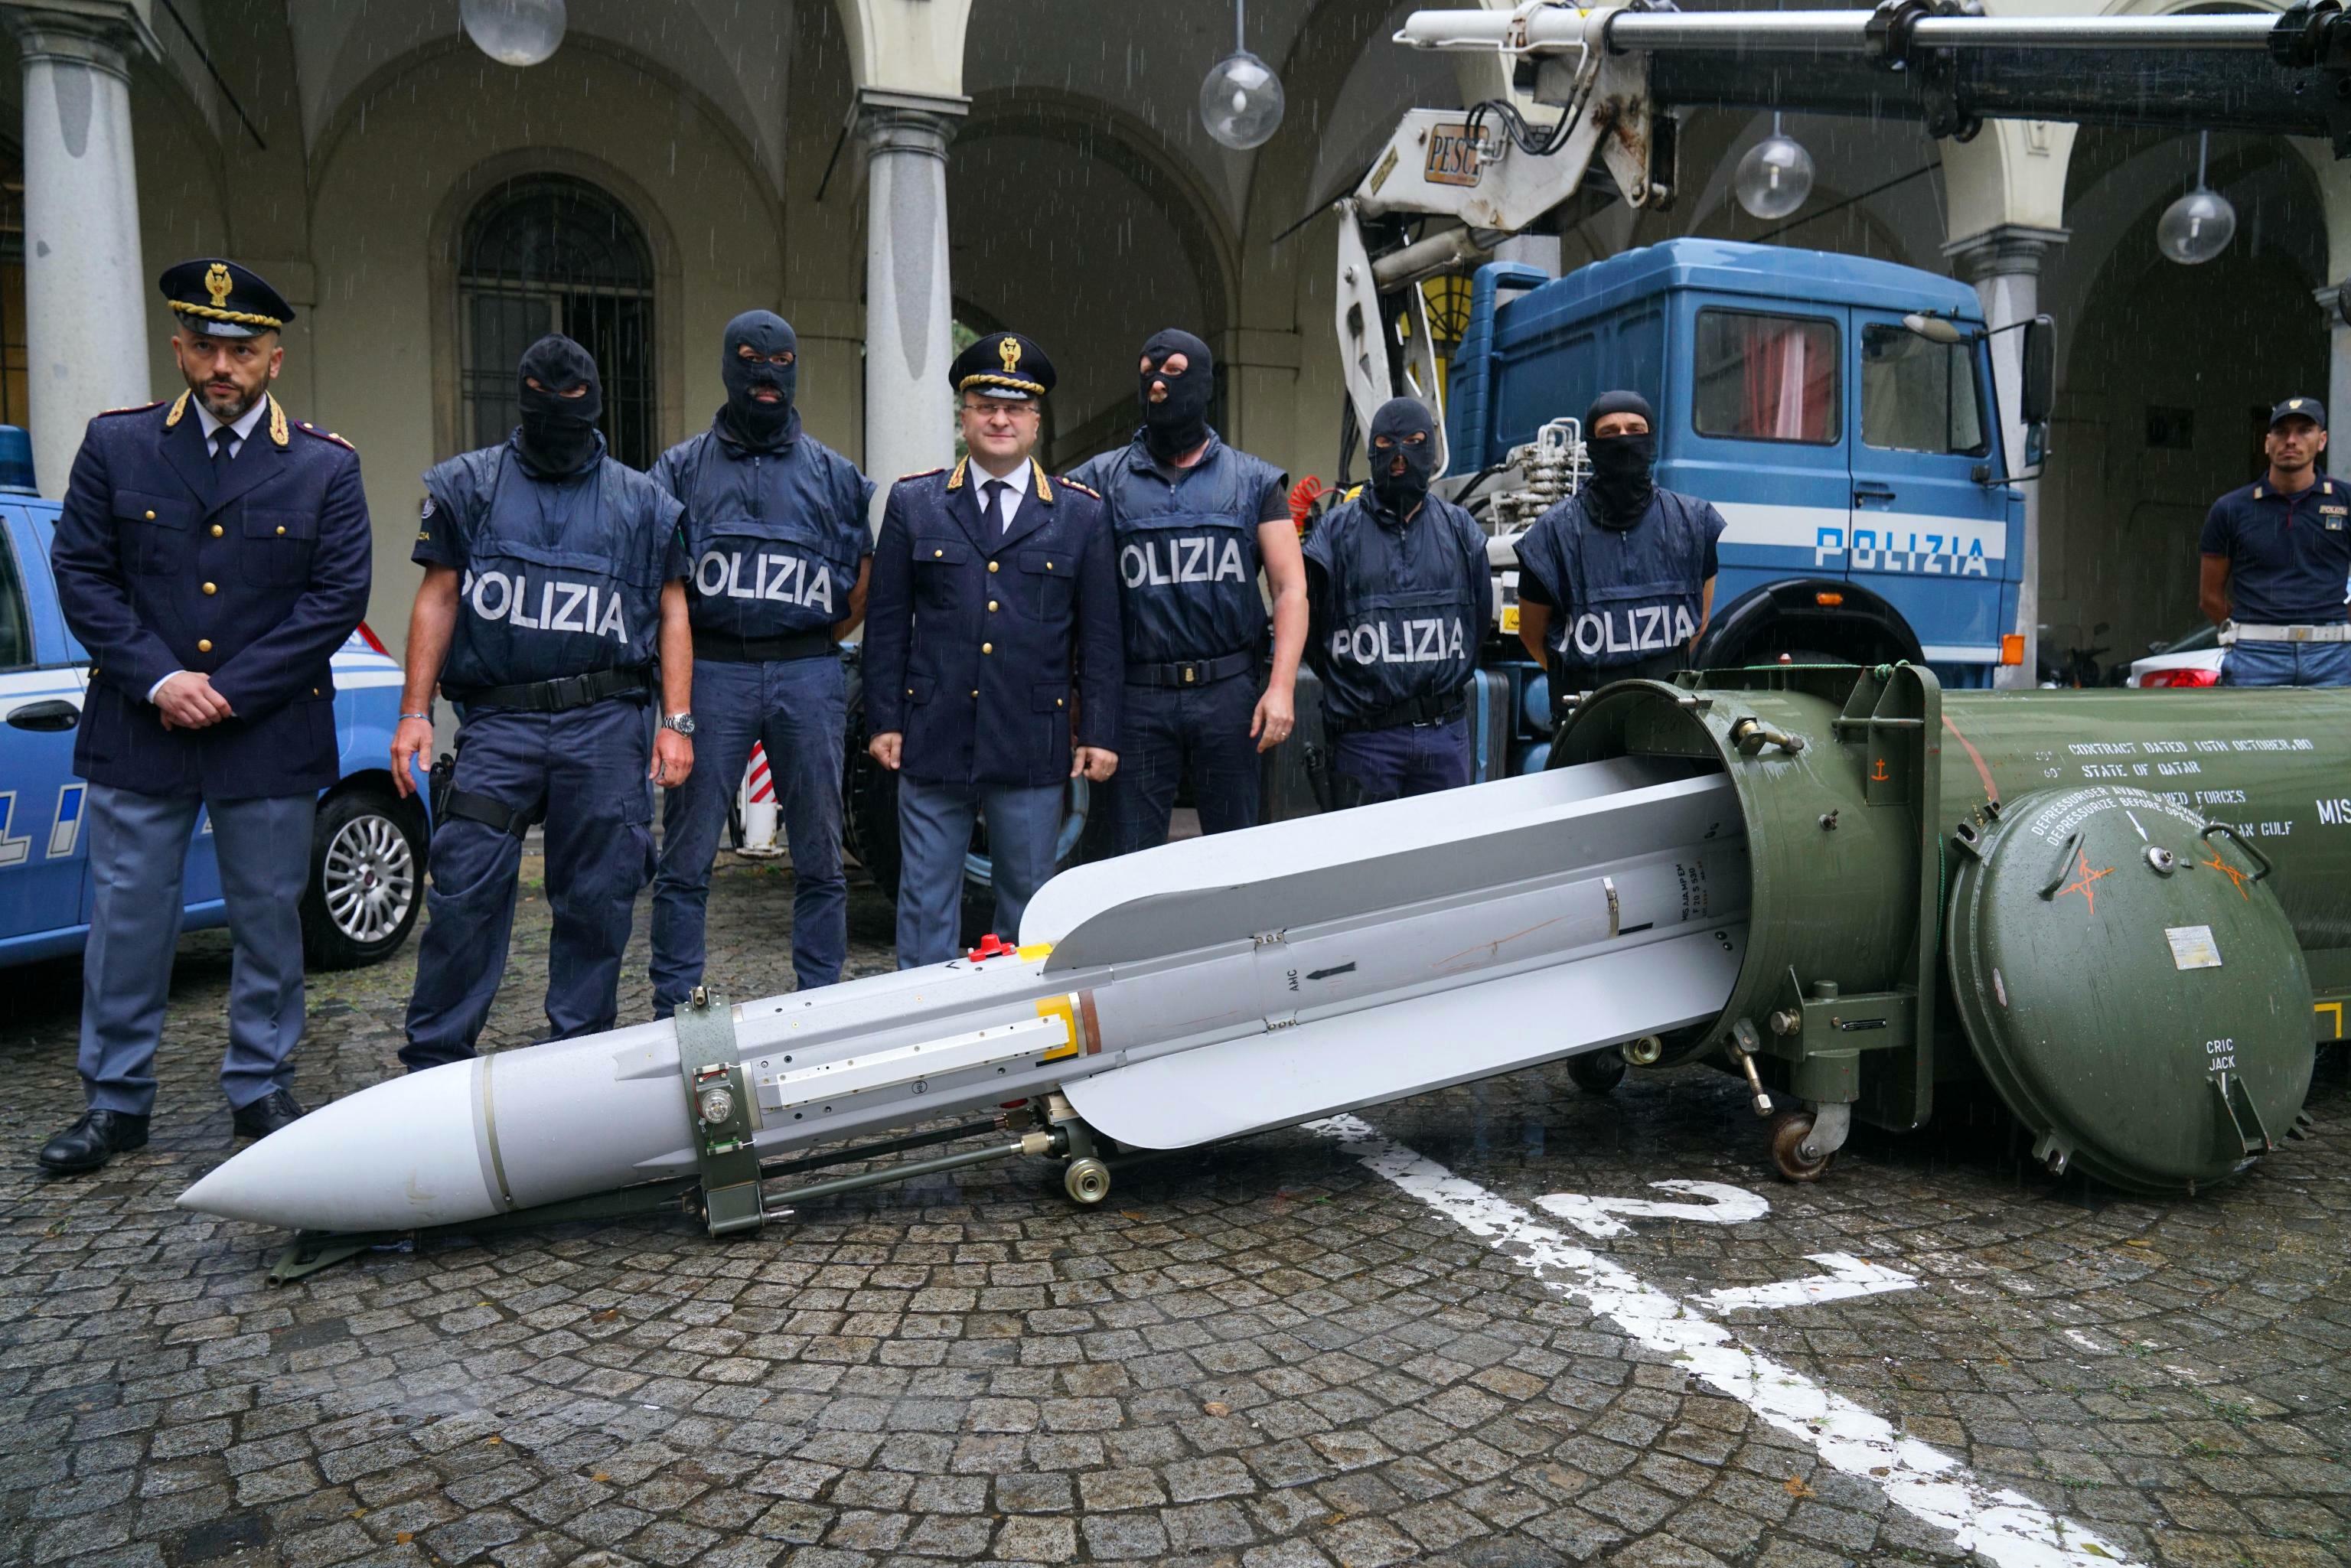 Italian Police Found an 11-foot-long Missile and Nazi Propaganda During a Far-Right Raid.